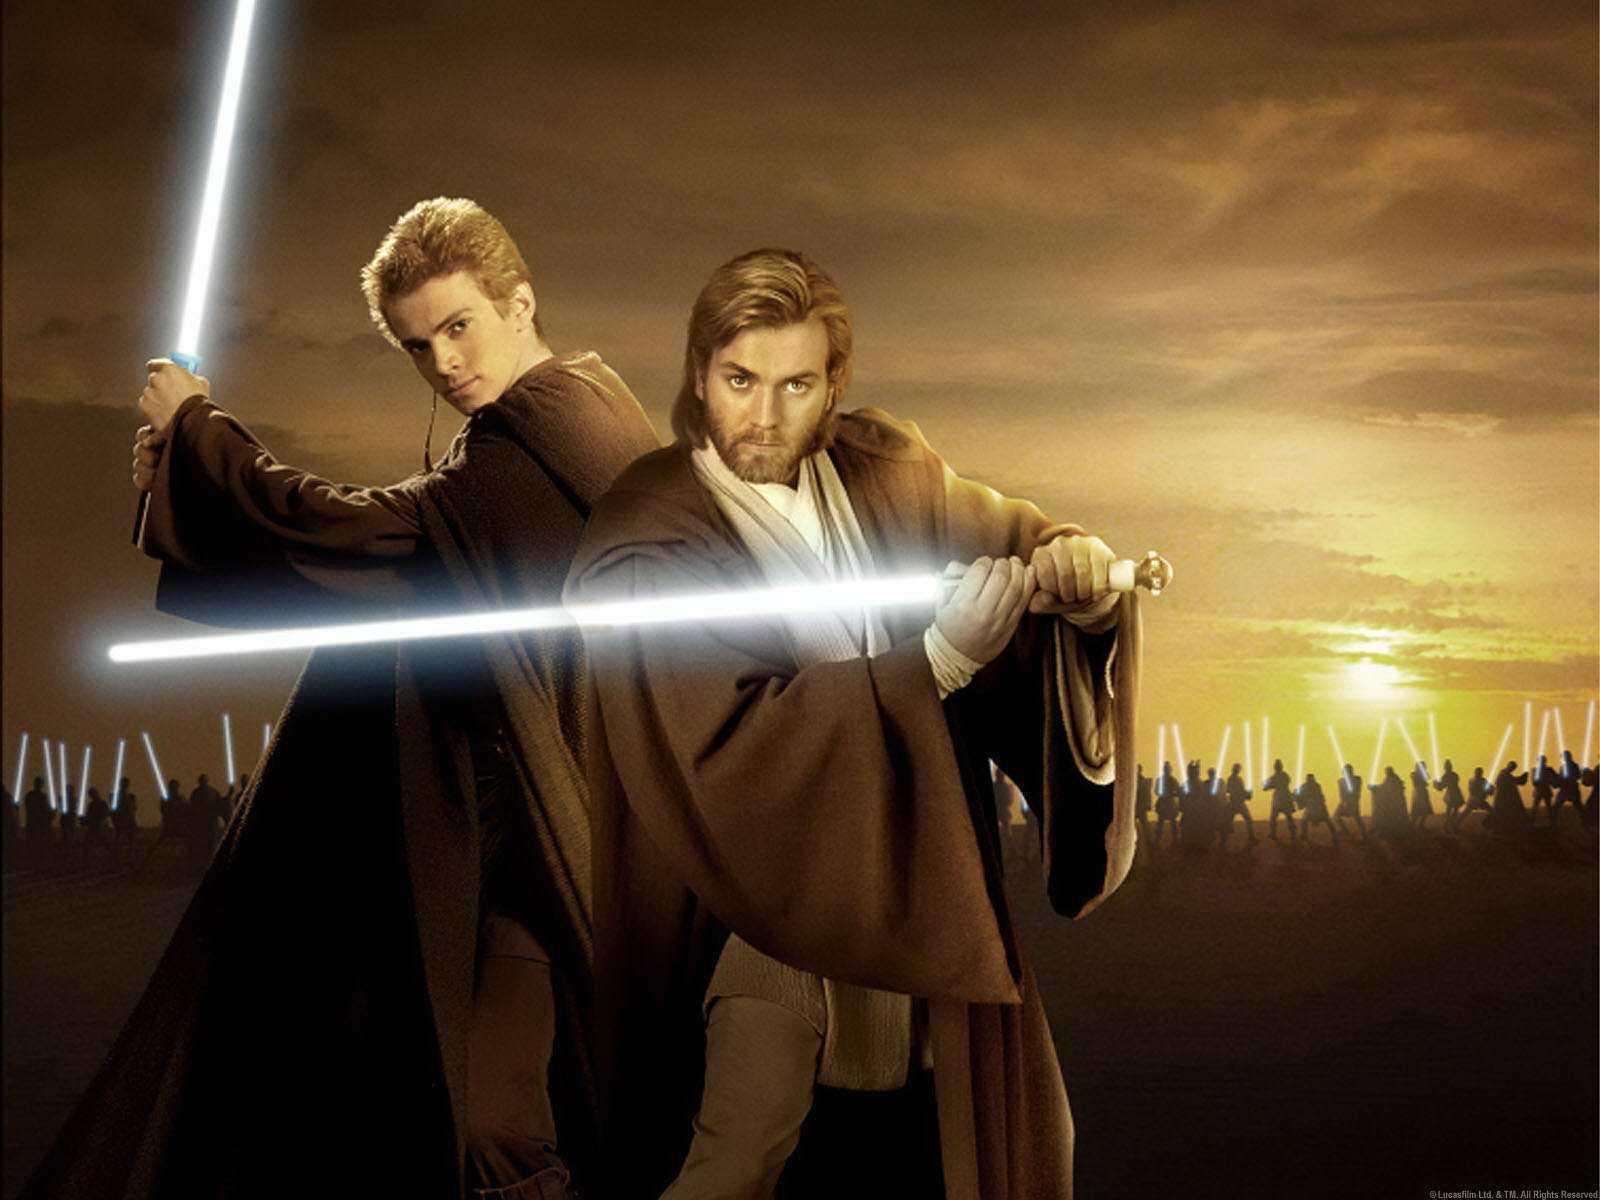 Download obi wan kenobi and Anakin skywalker Anakin and Obi wan 1600x1200